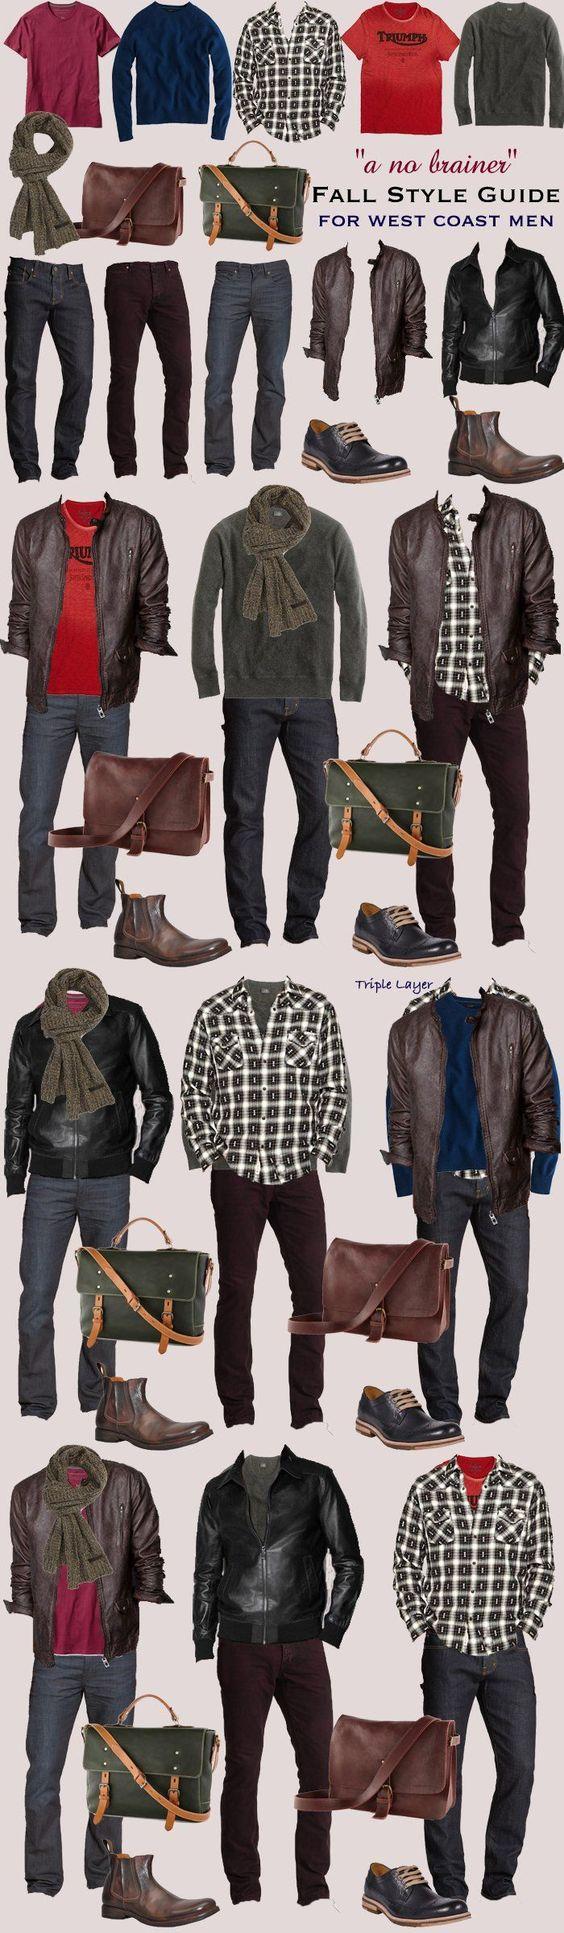 (21) Pin by GentlemansEssentials on Gentlemans's Apparel | Pinterest